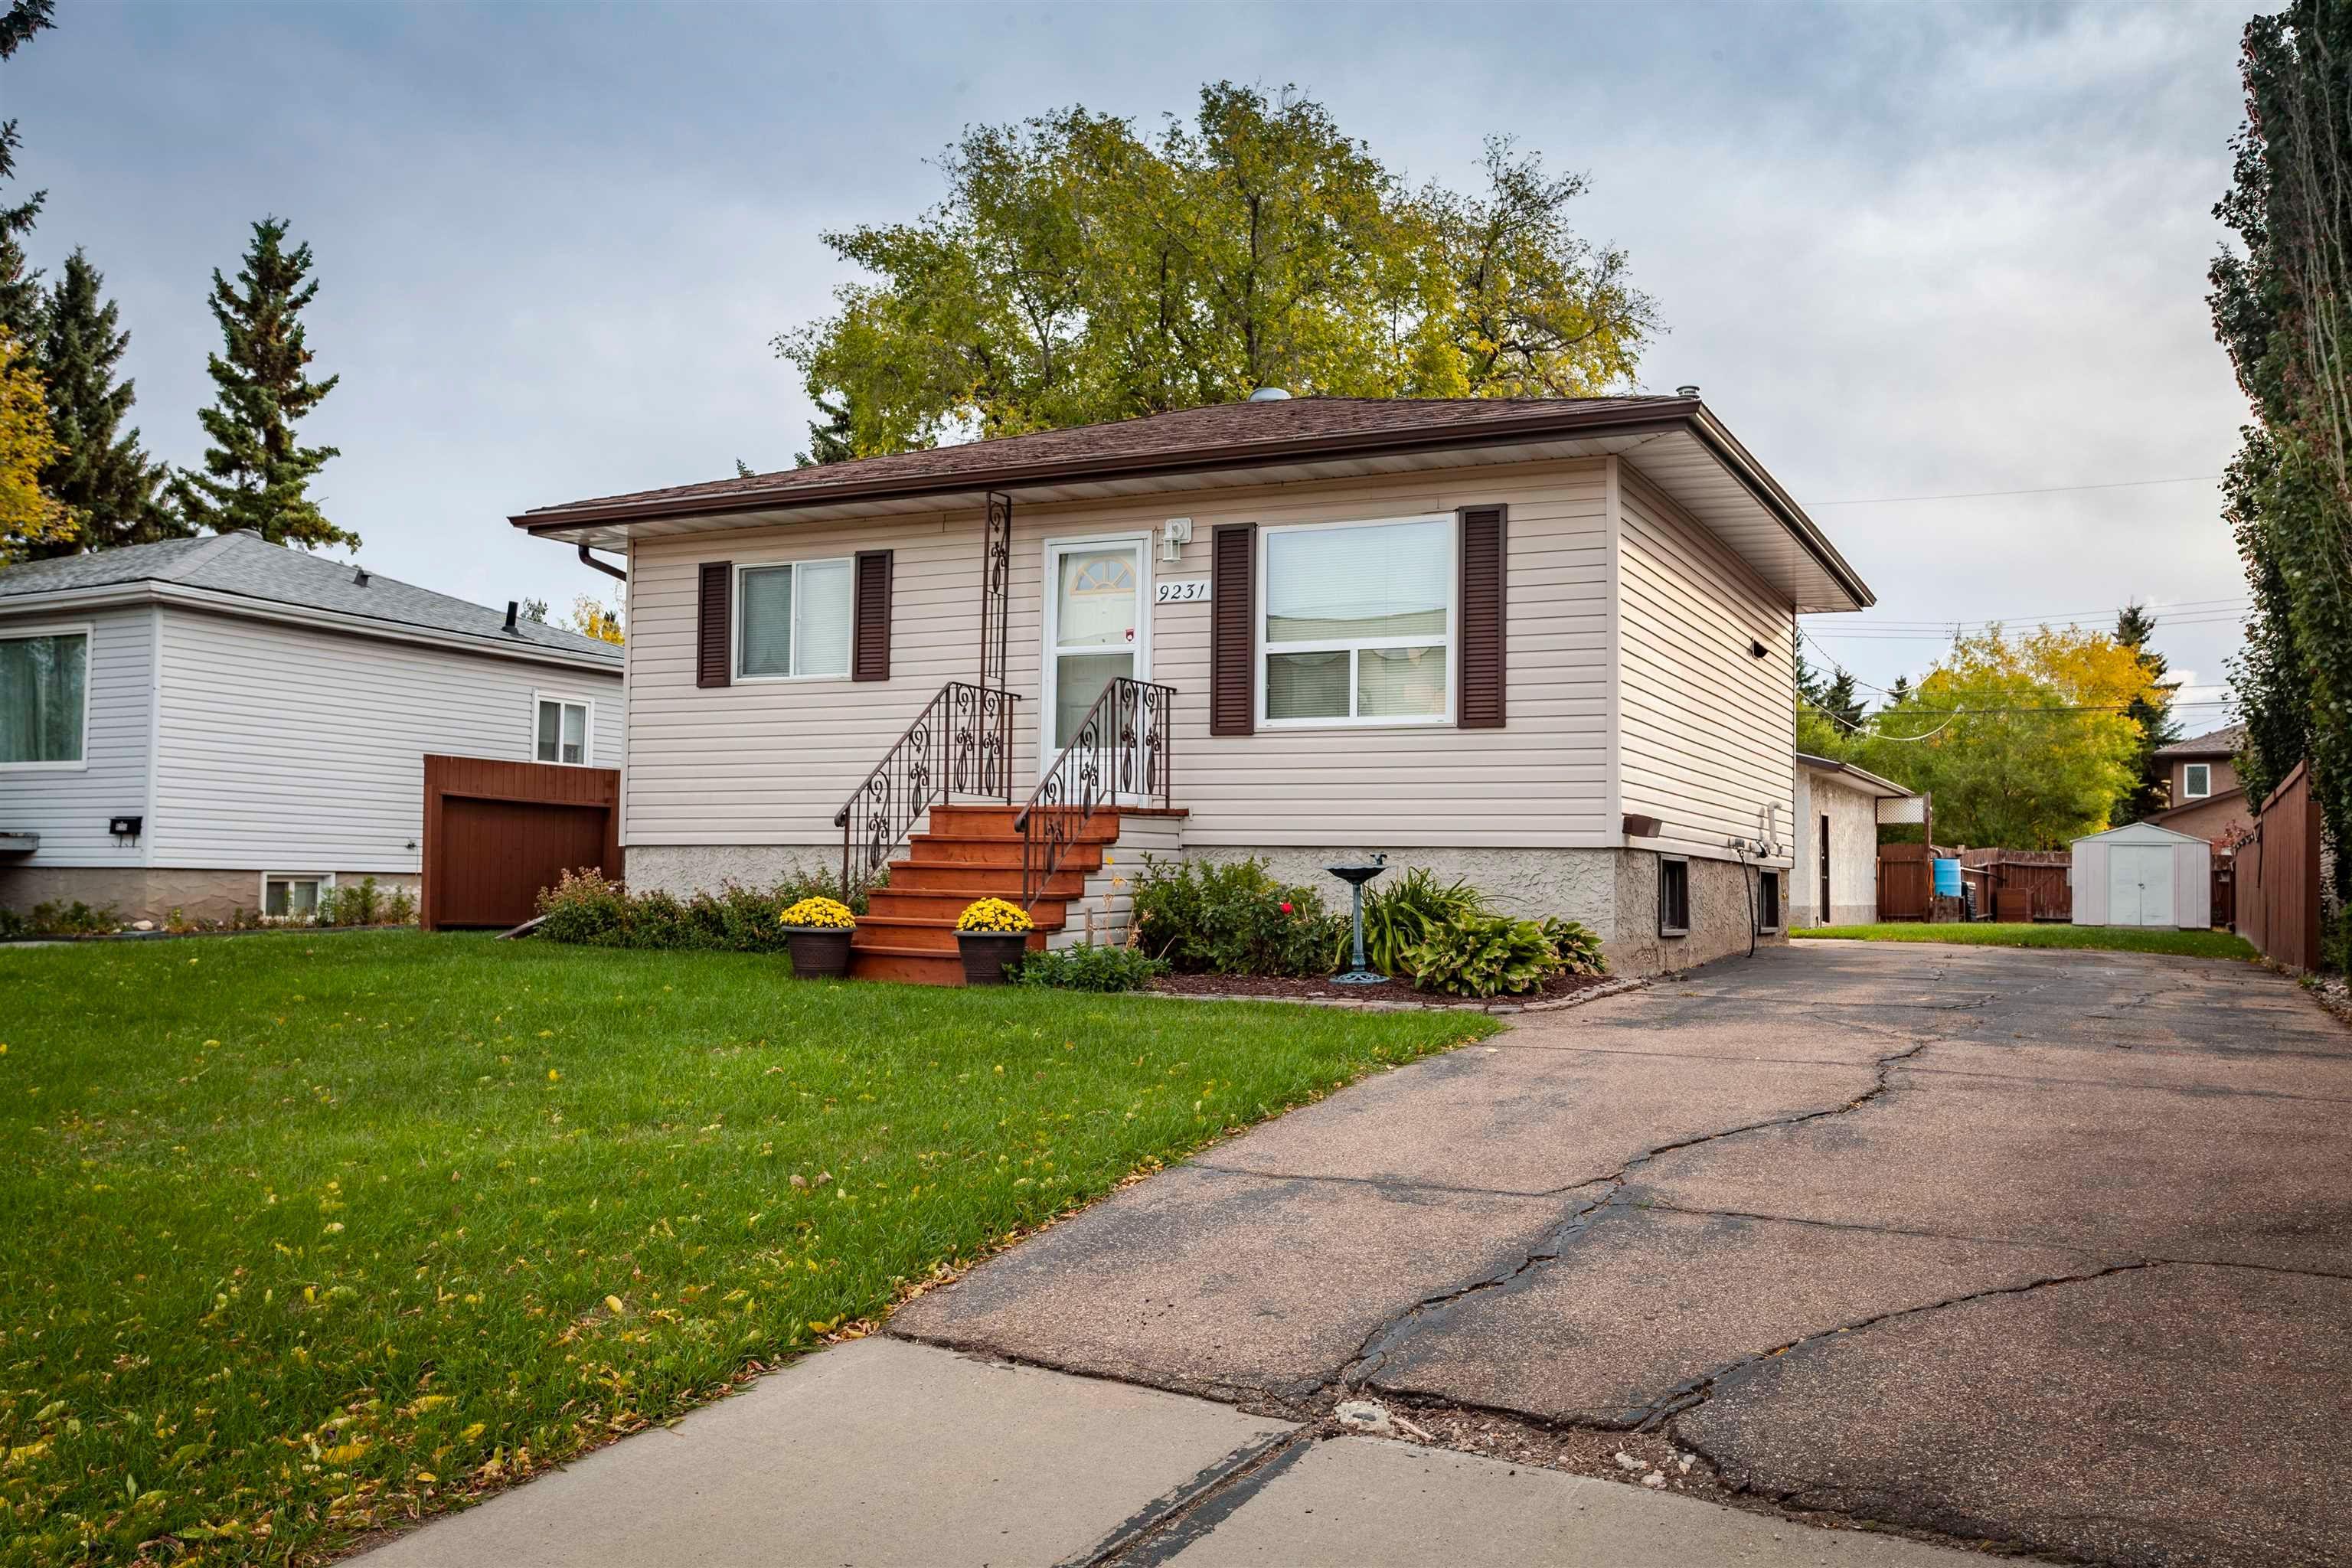 Main Photo: 9231 155 Street in Edmonton: Zone 22 House for sale : MLS®# E4263117